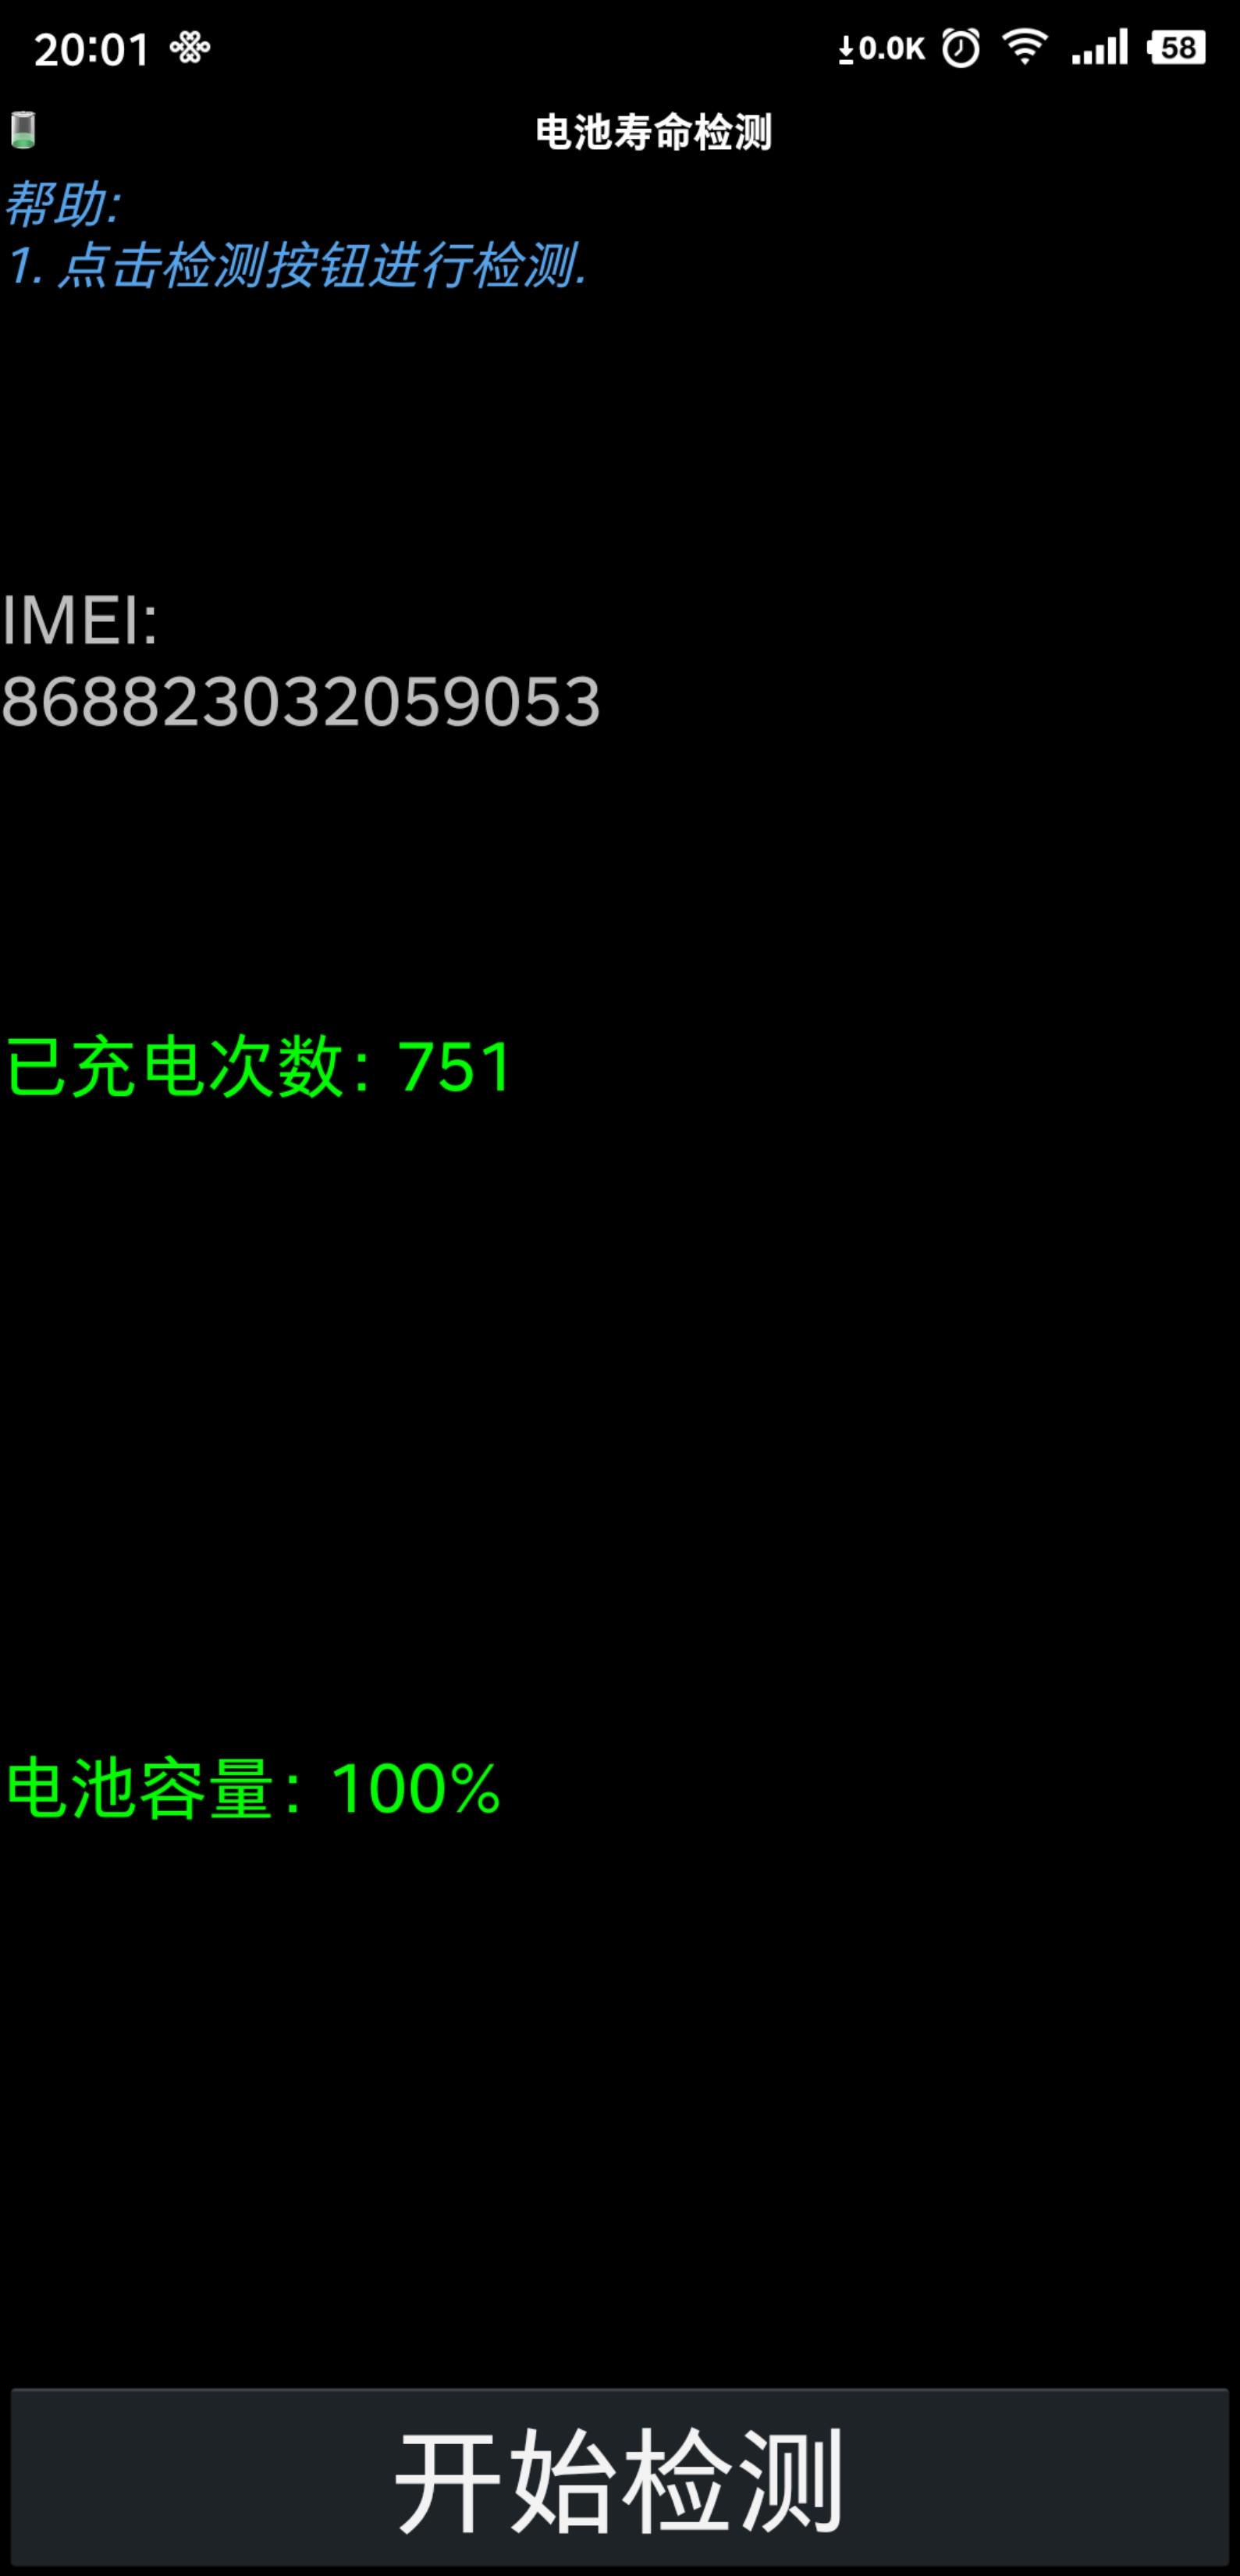 Screenshot_2020-04-23-20-01-52-600_??????.png